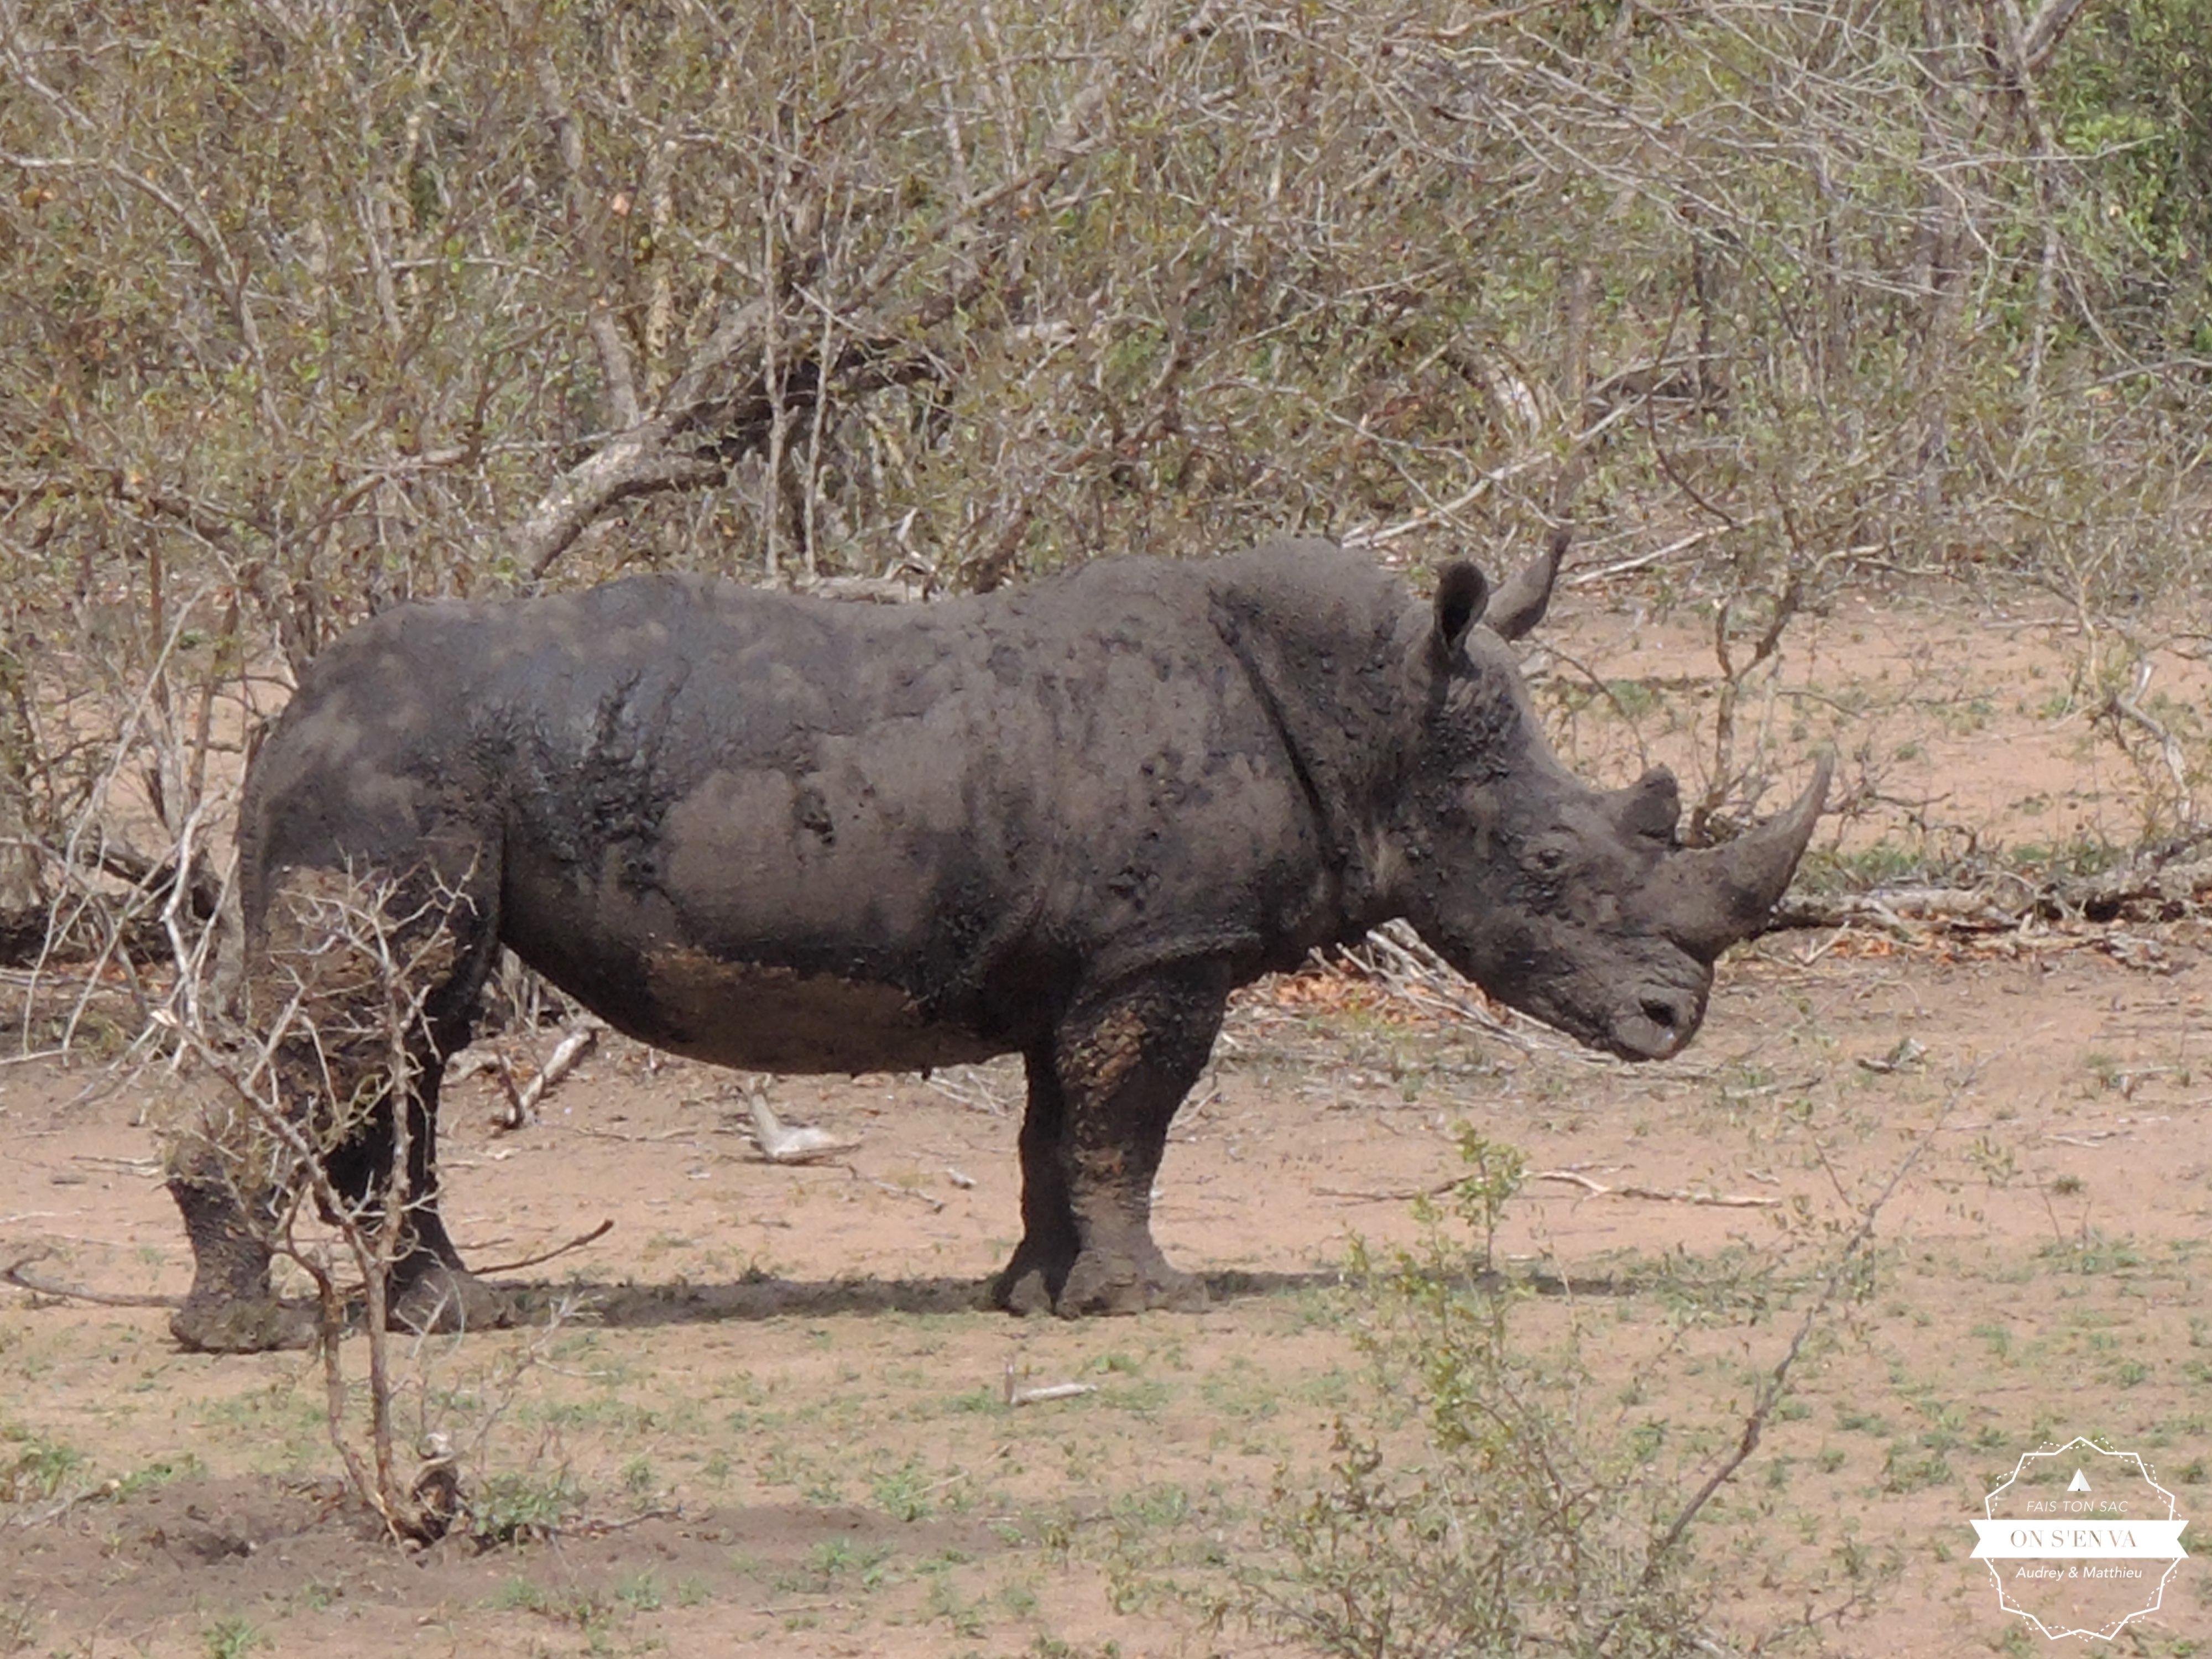 Papa rhino